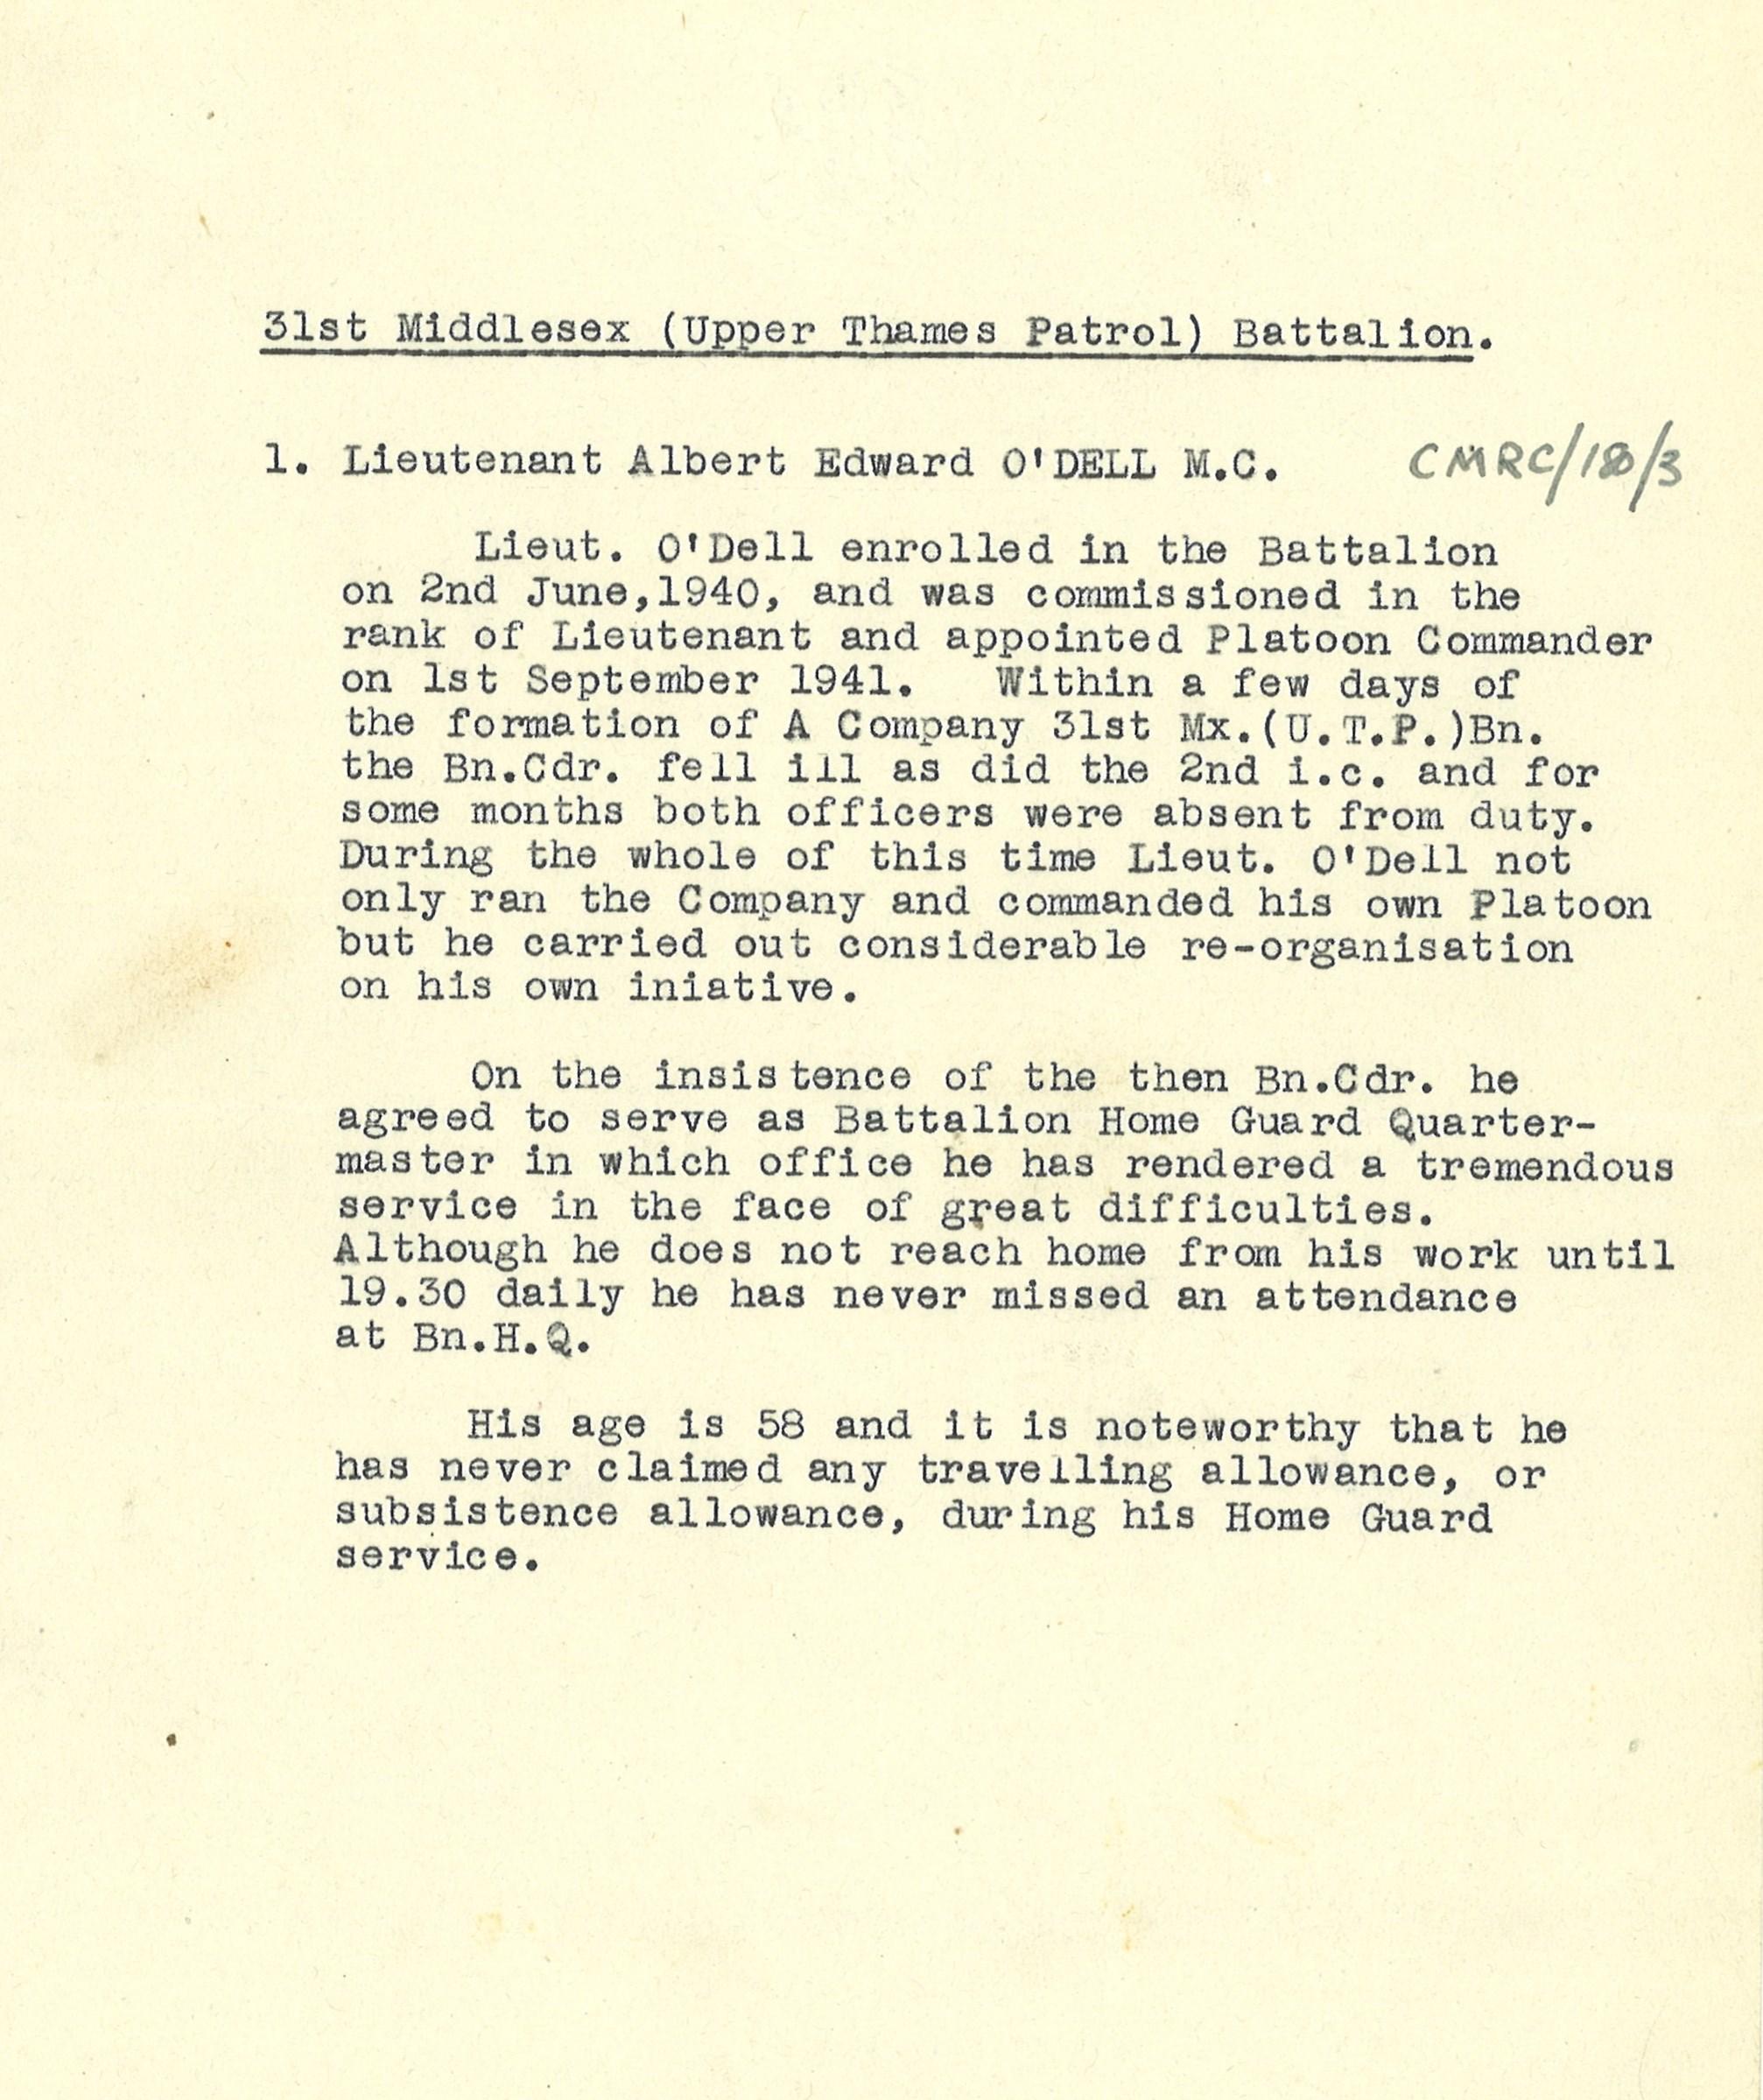 Typewritten recommendation for Lieutenant Albert Edward O'Dell